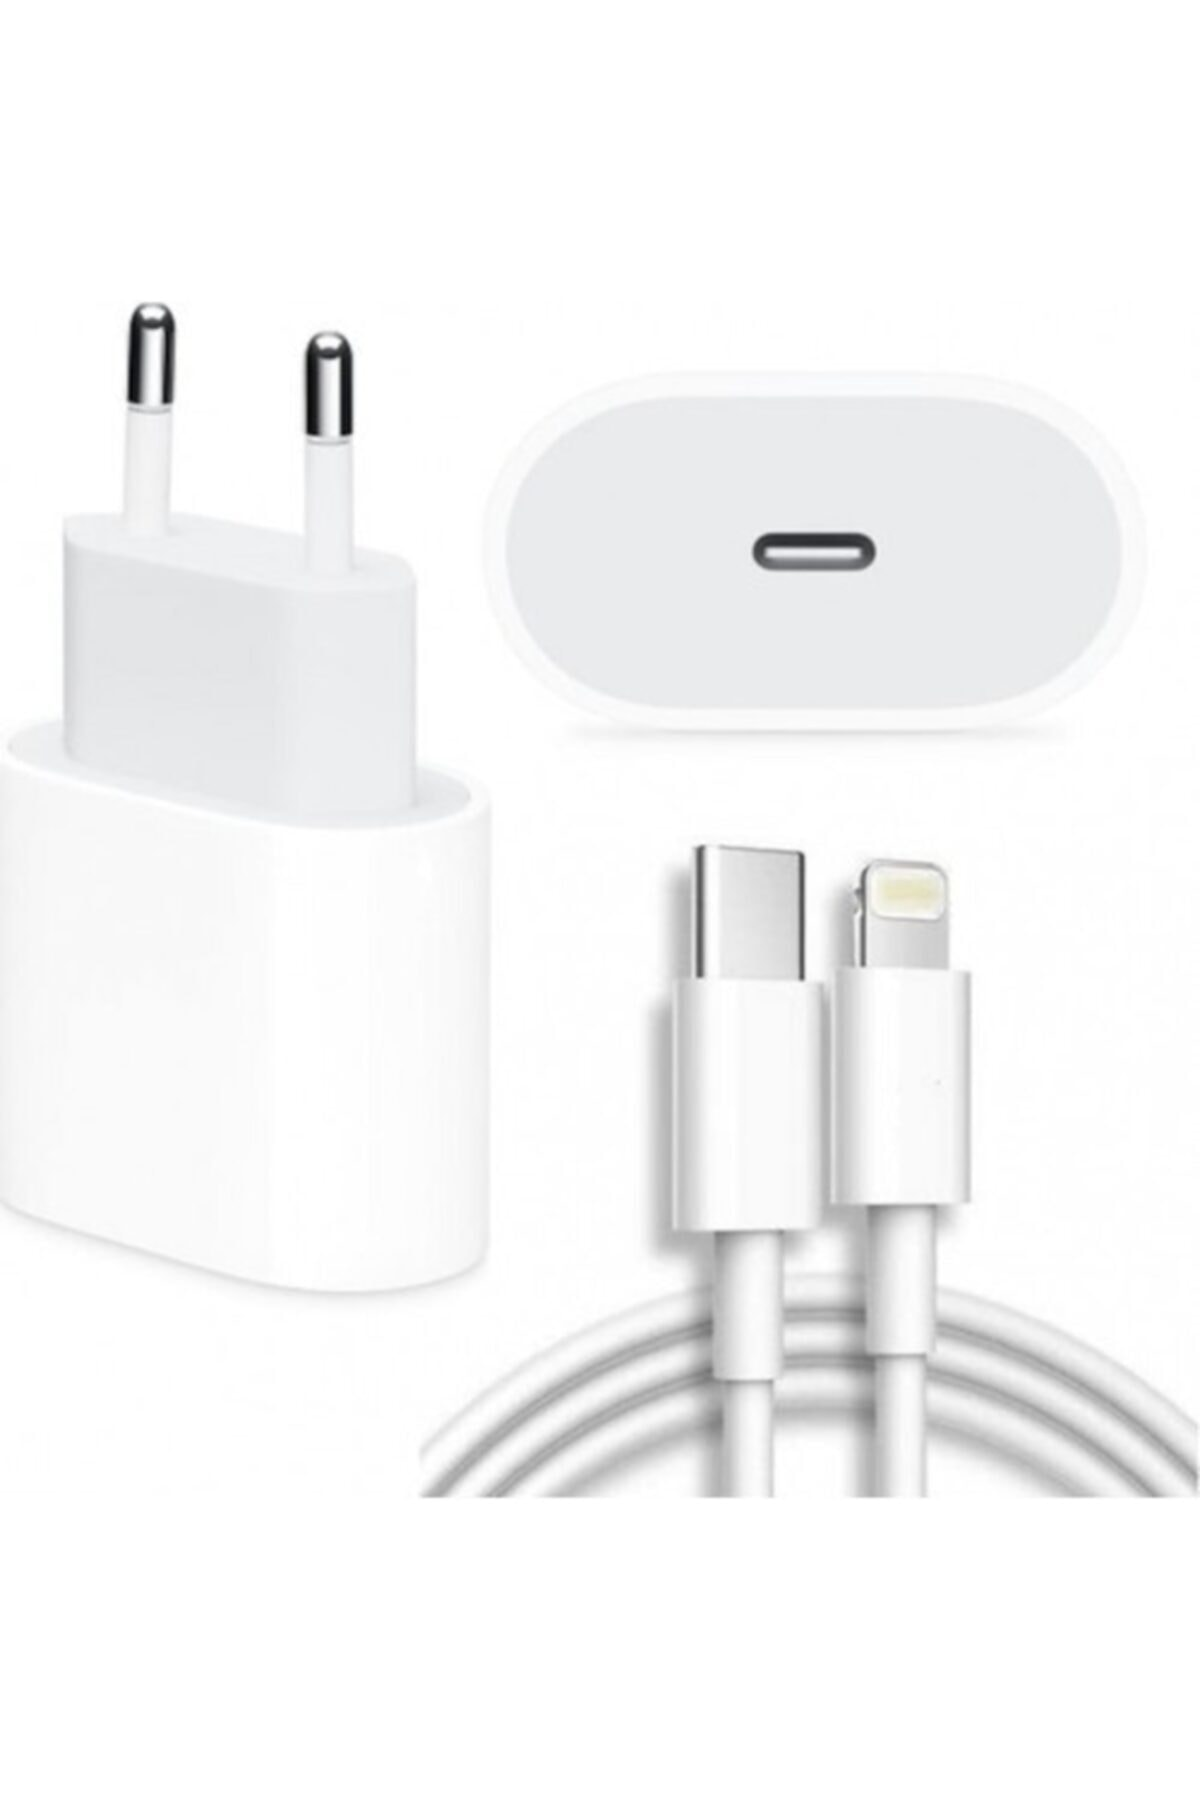 Revix Apple Macbook Ipad Iphone 11 / 12 - Pro Max Mini Uyumlu 20w Adaptör Kablo Usb-c Pd Hızlı Şarj Aleti 1